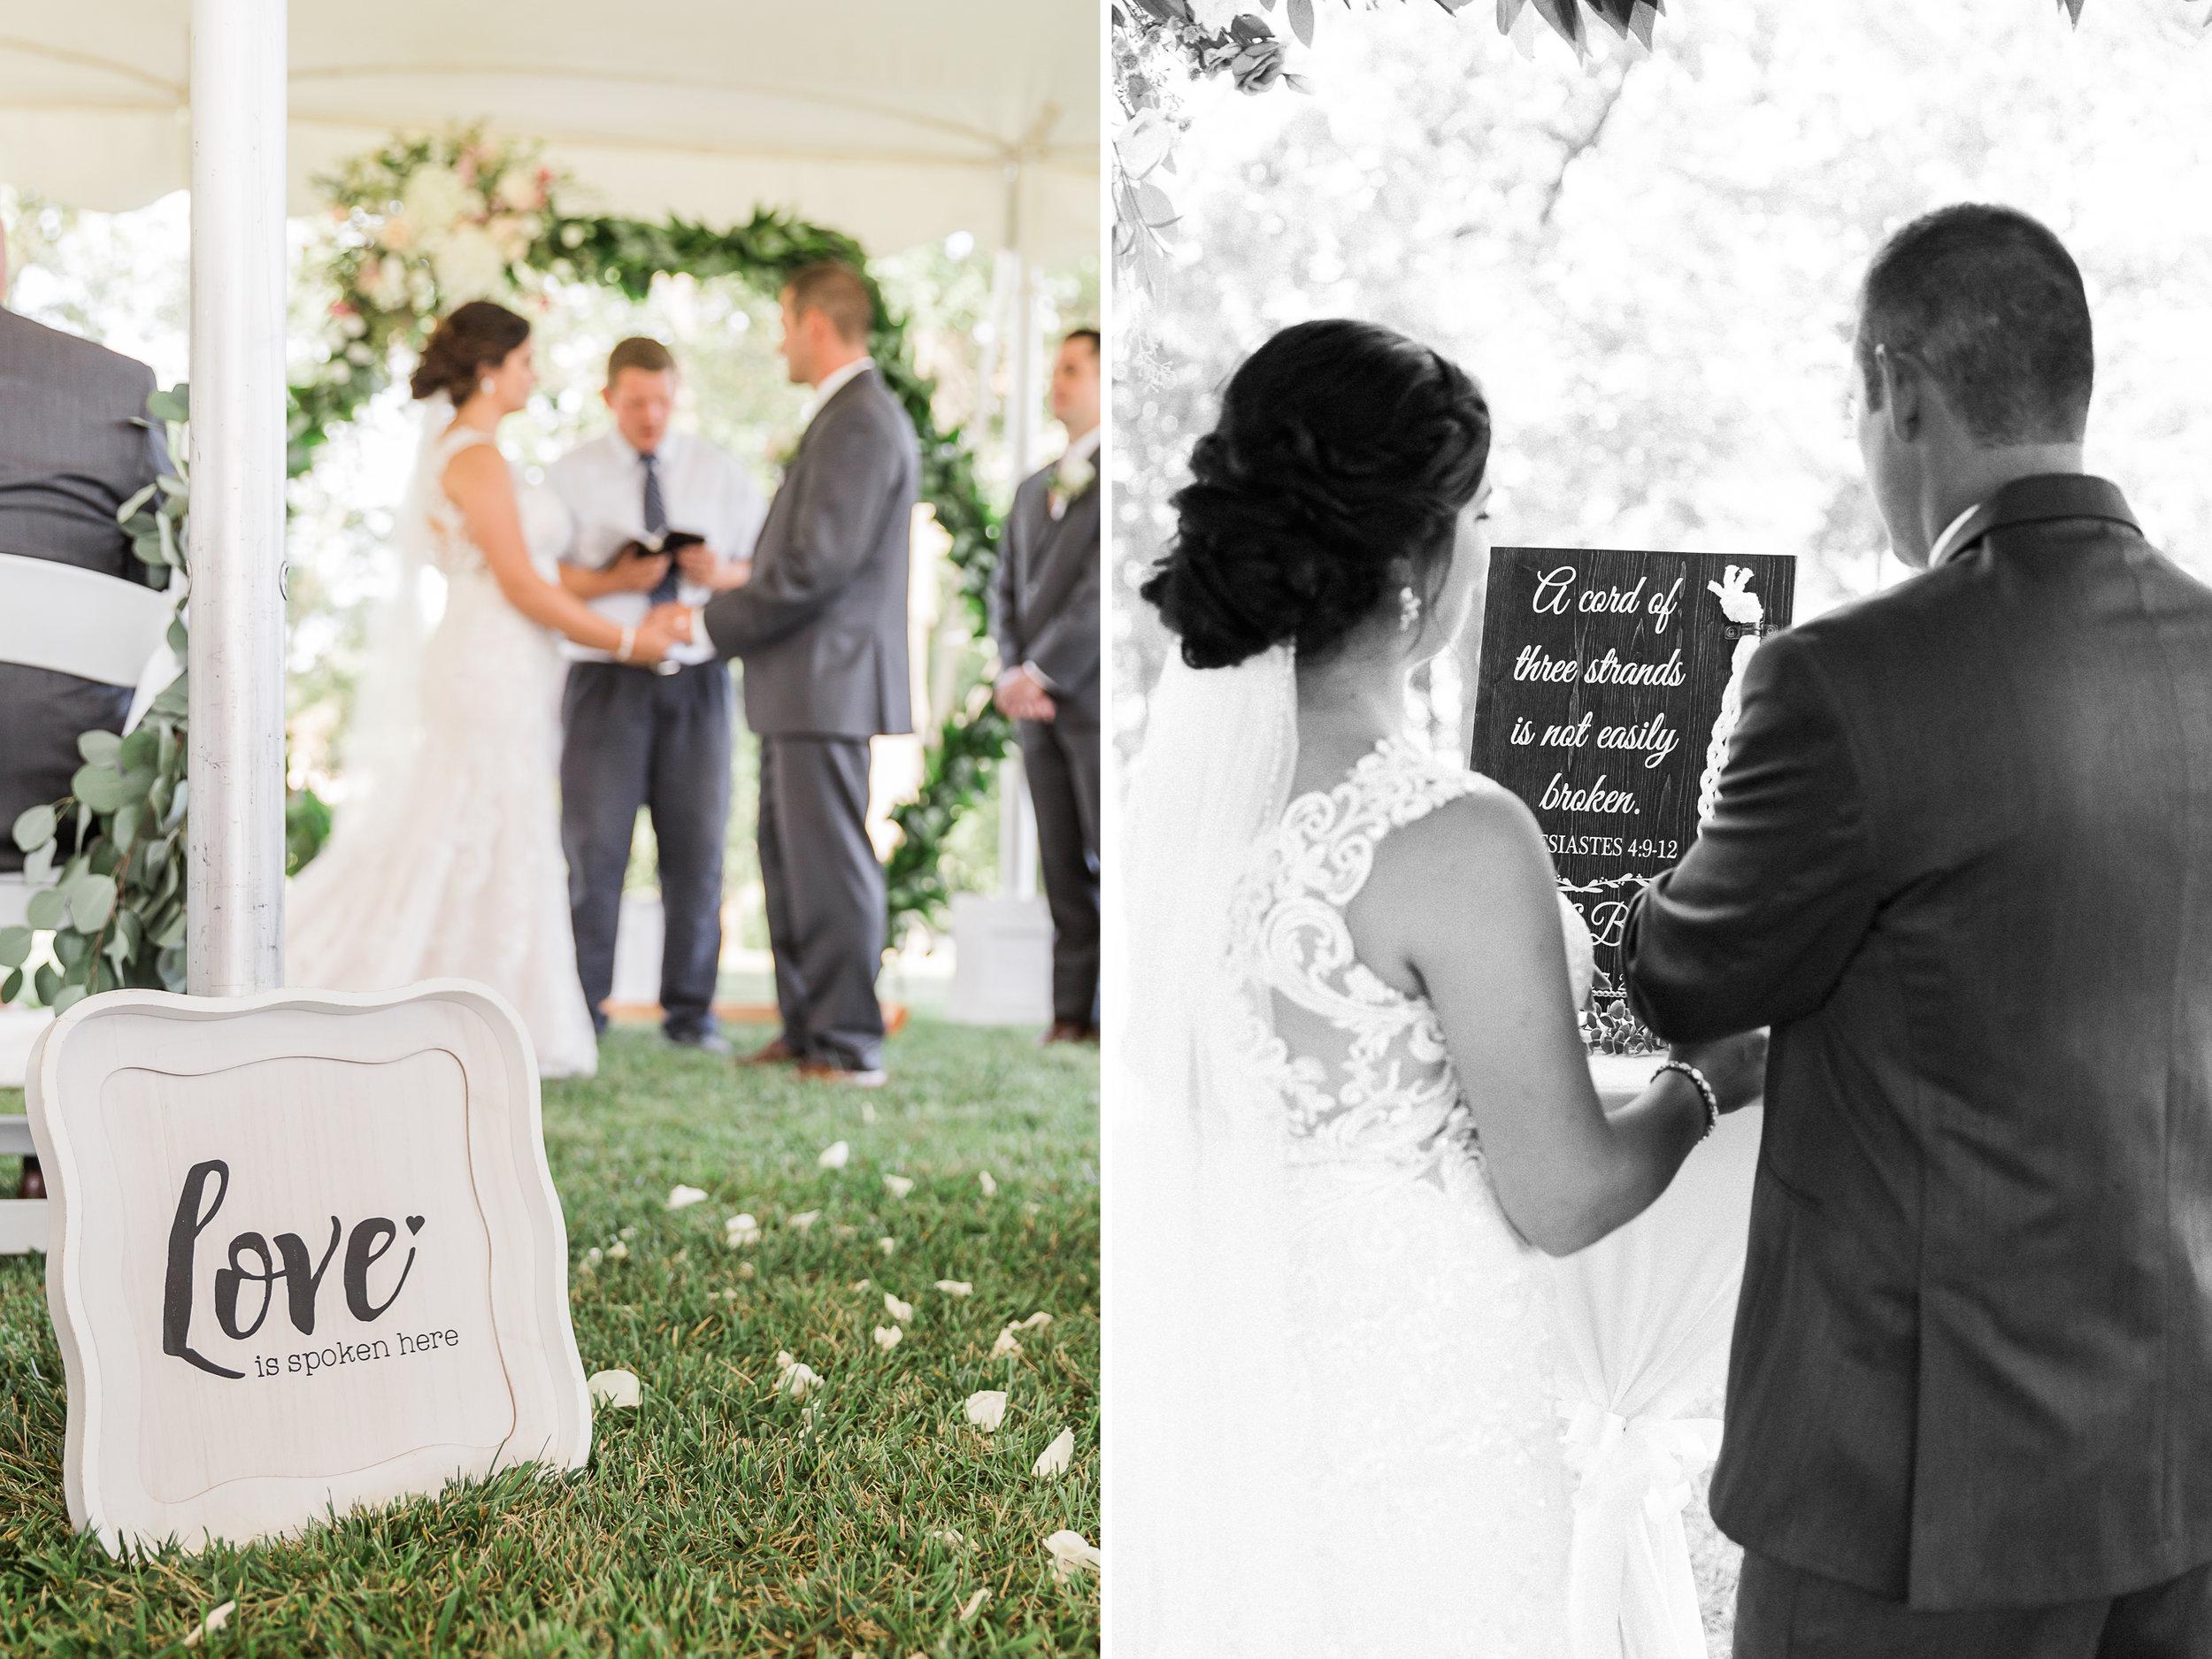 romanticcountrywedding-14.jpg